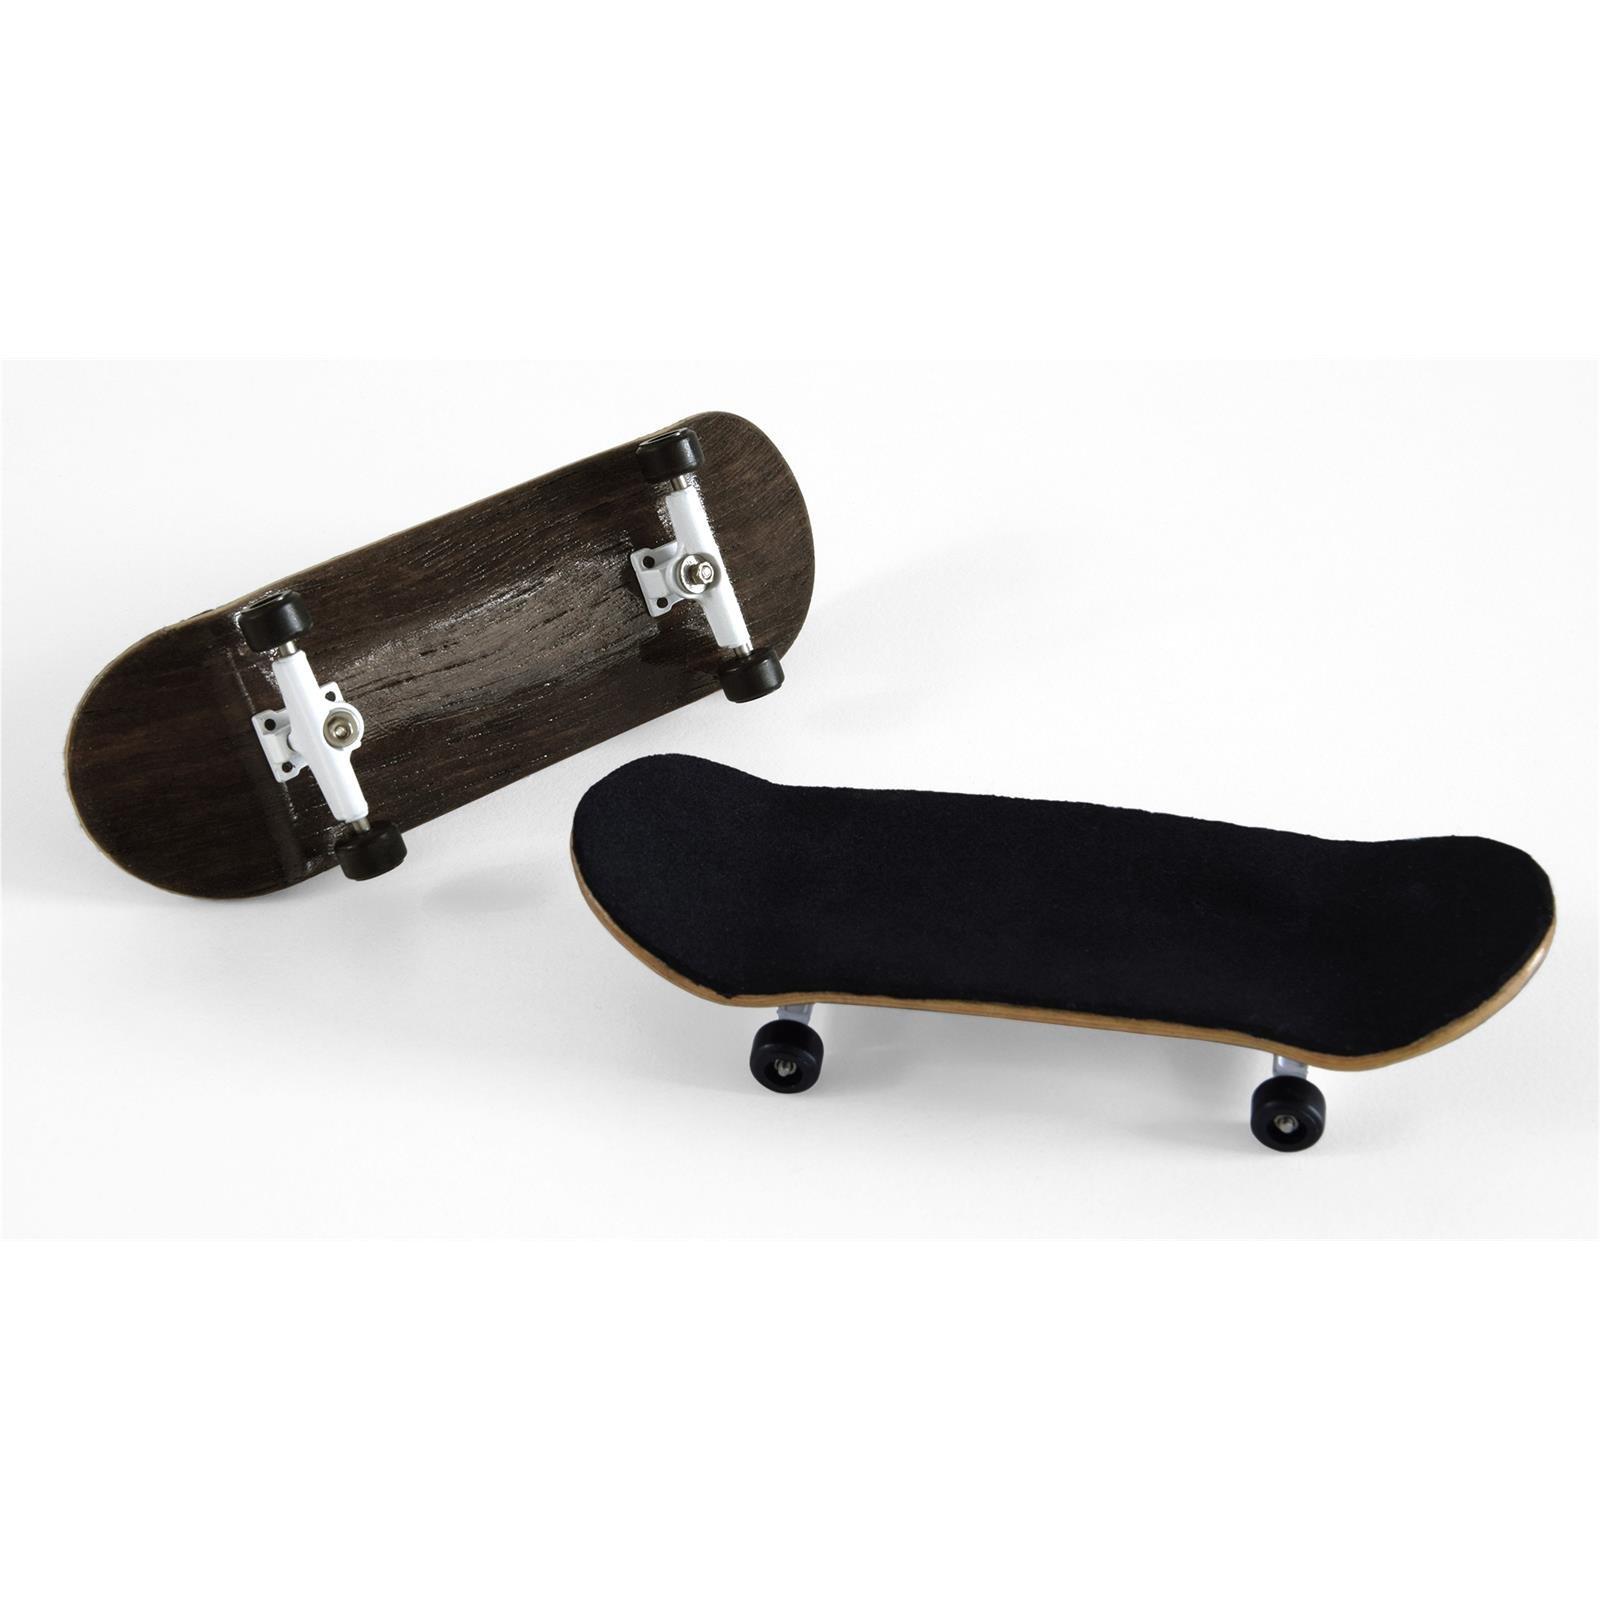 Cheap Finger Skateboard Games, find Finger Skateboard Games